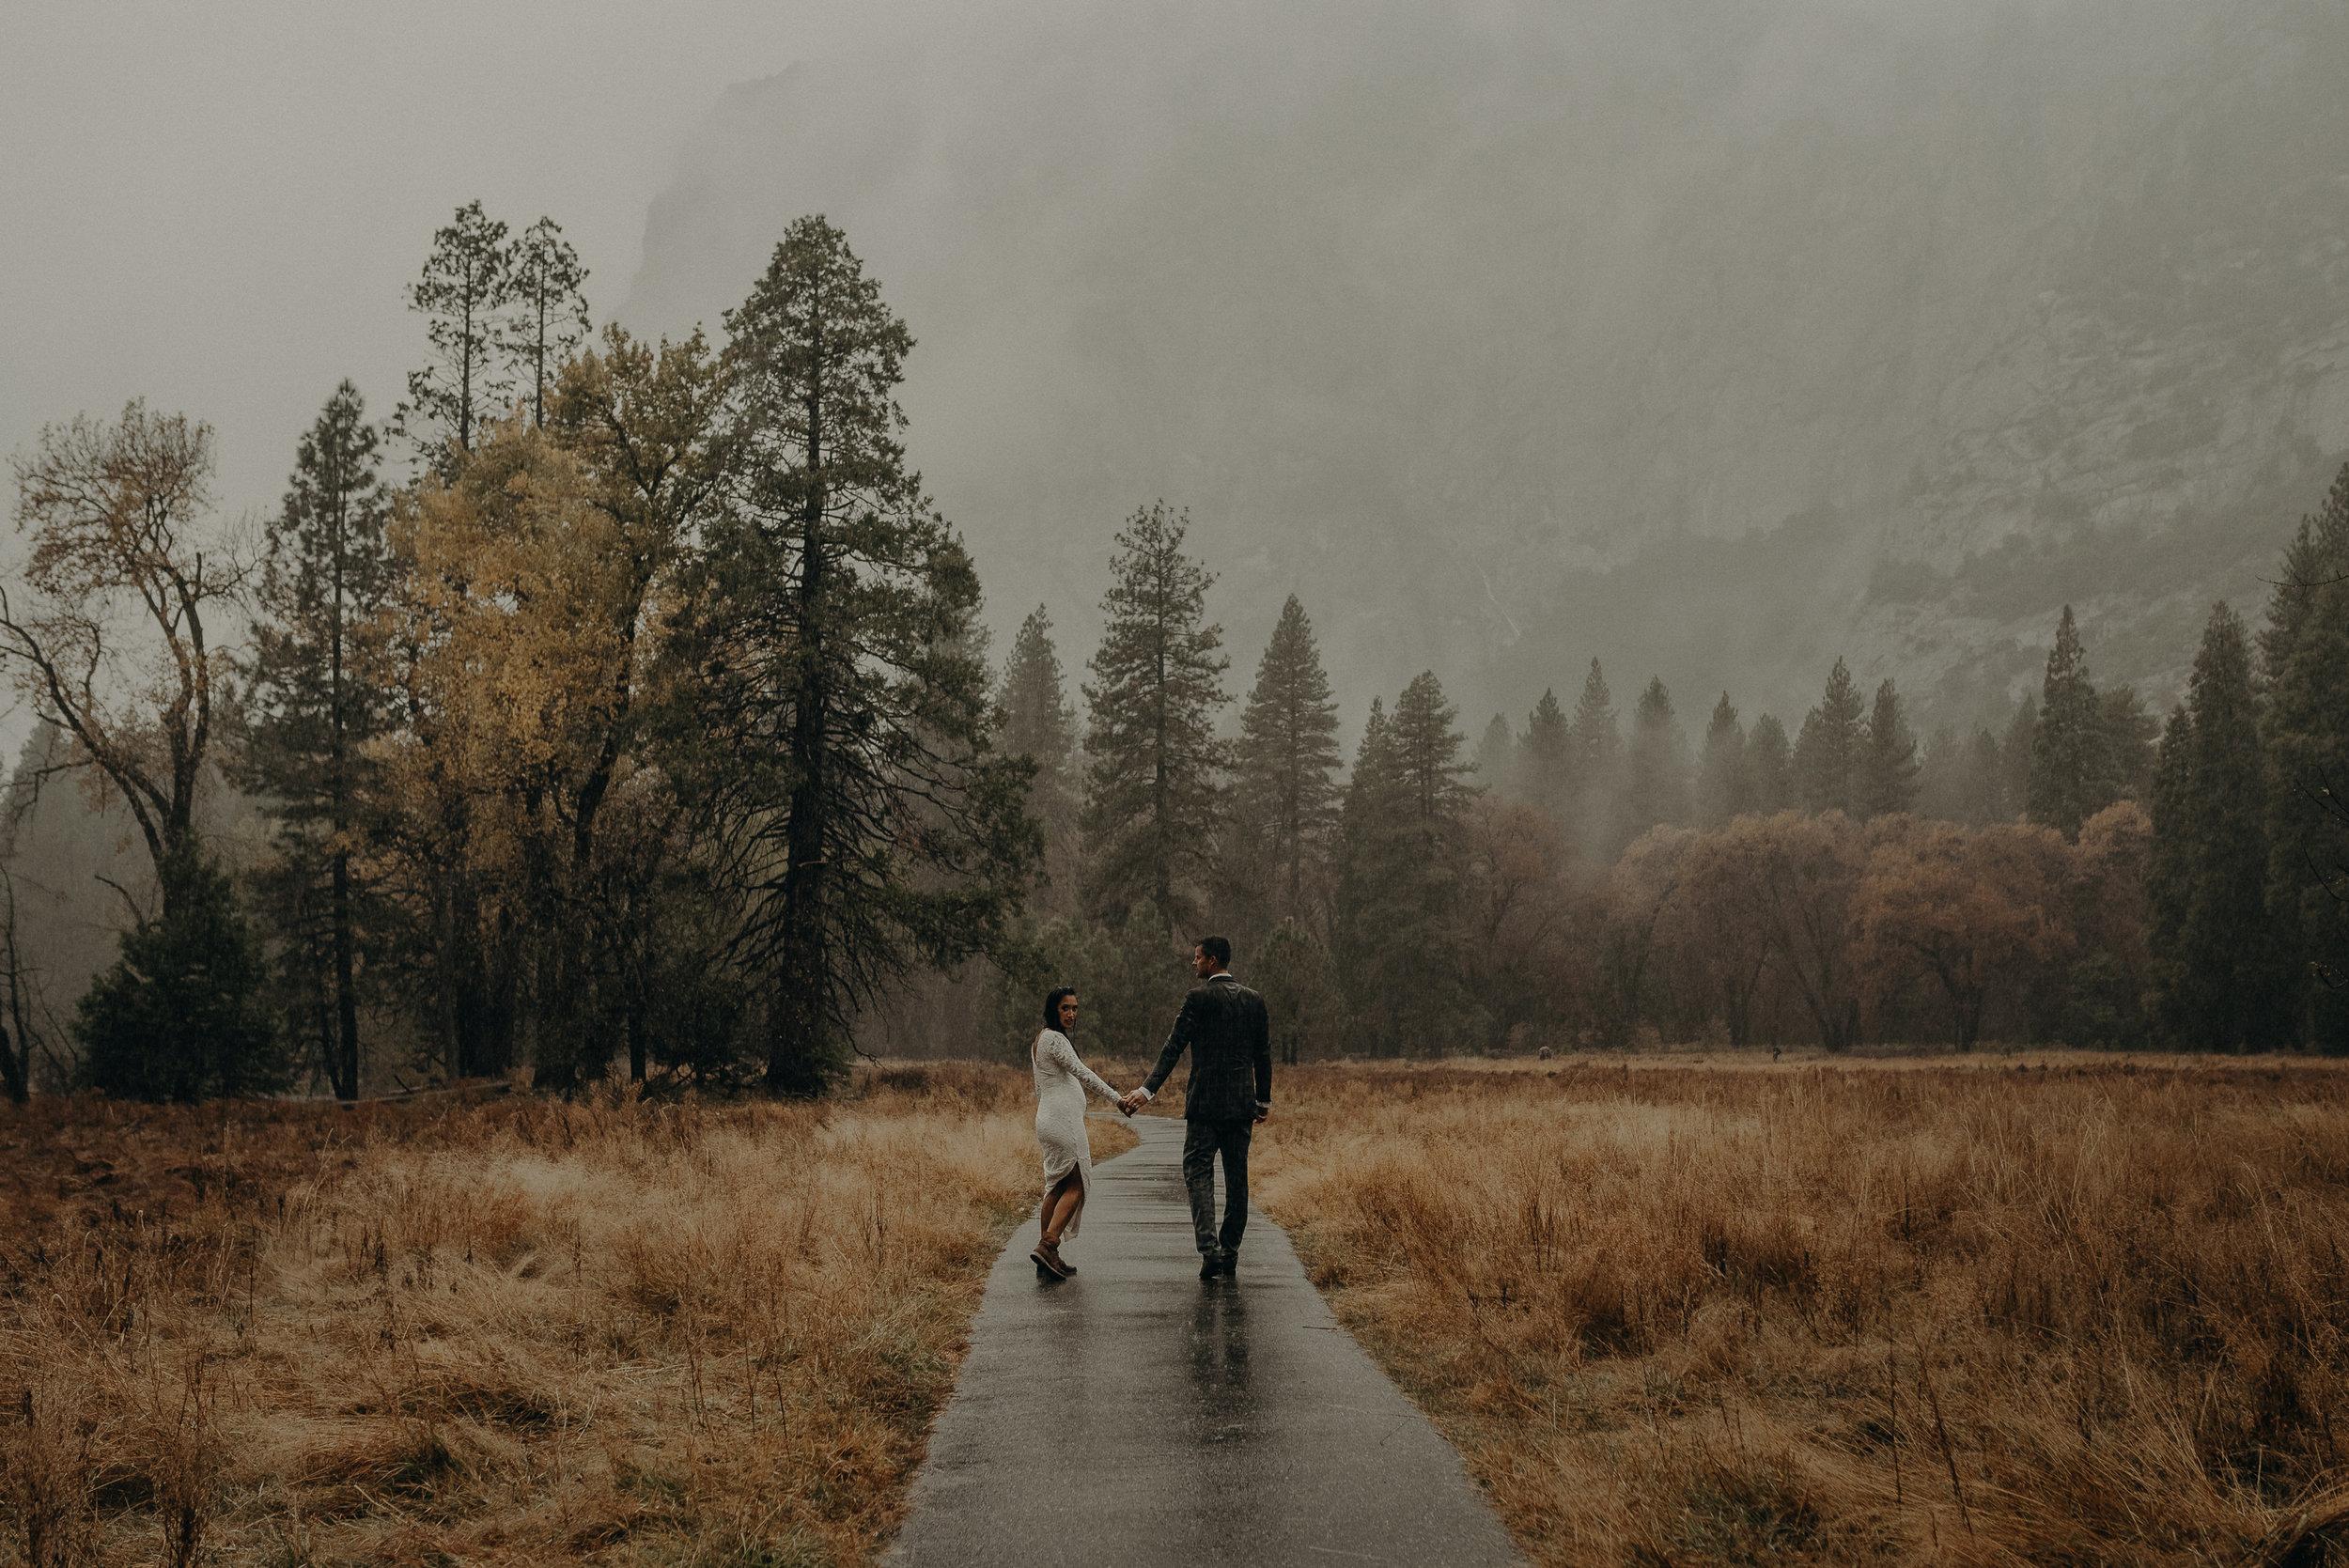 Isaiah + Taylor Photography - Yosemite Elopement - Los Angeles Wedding Photographer-74.jpg